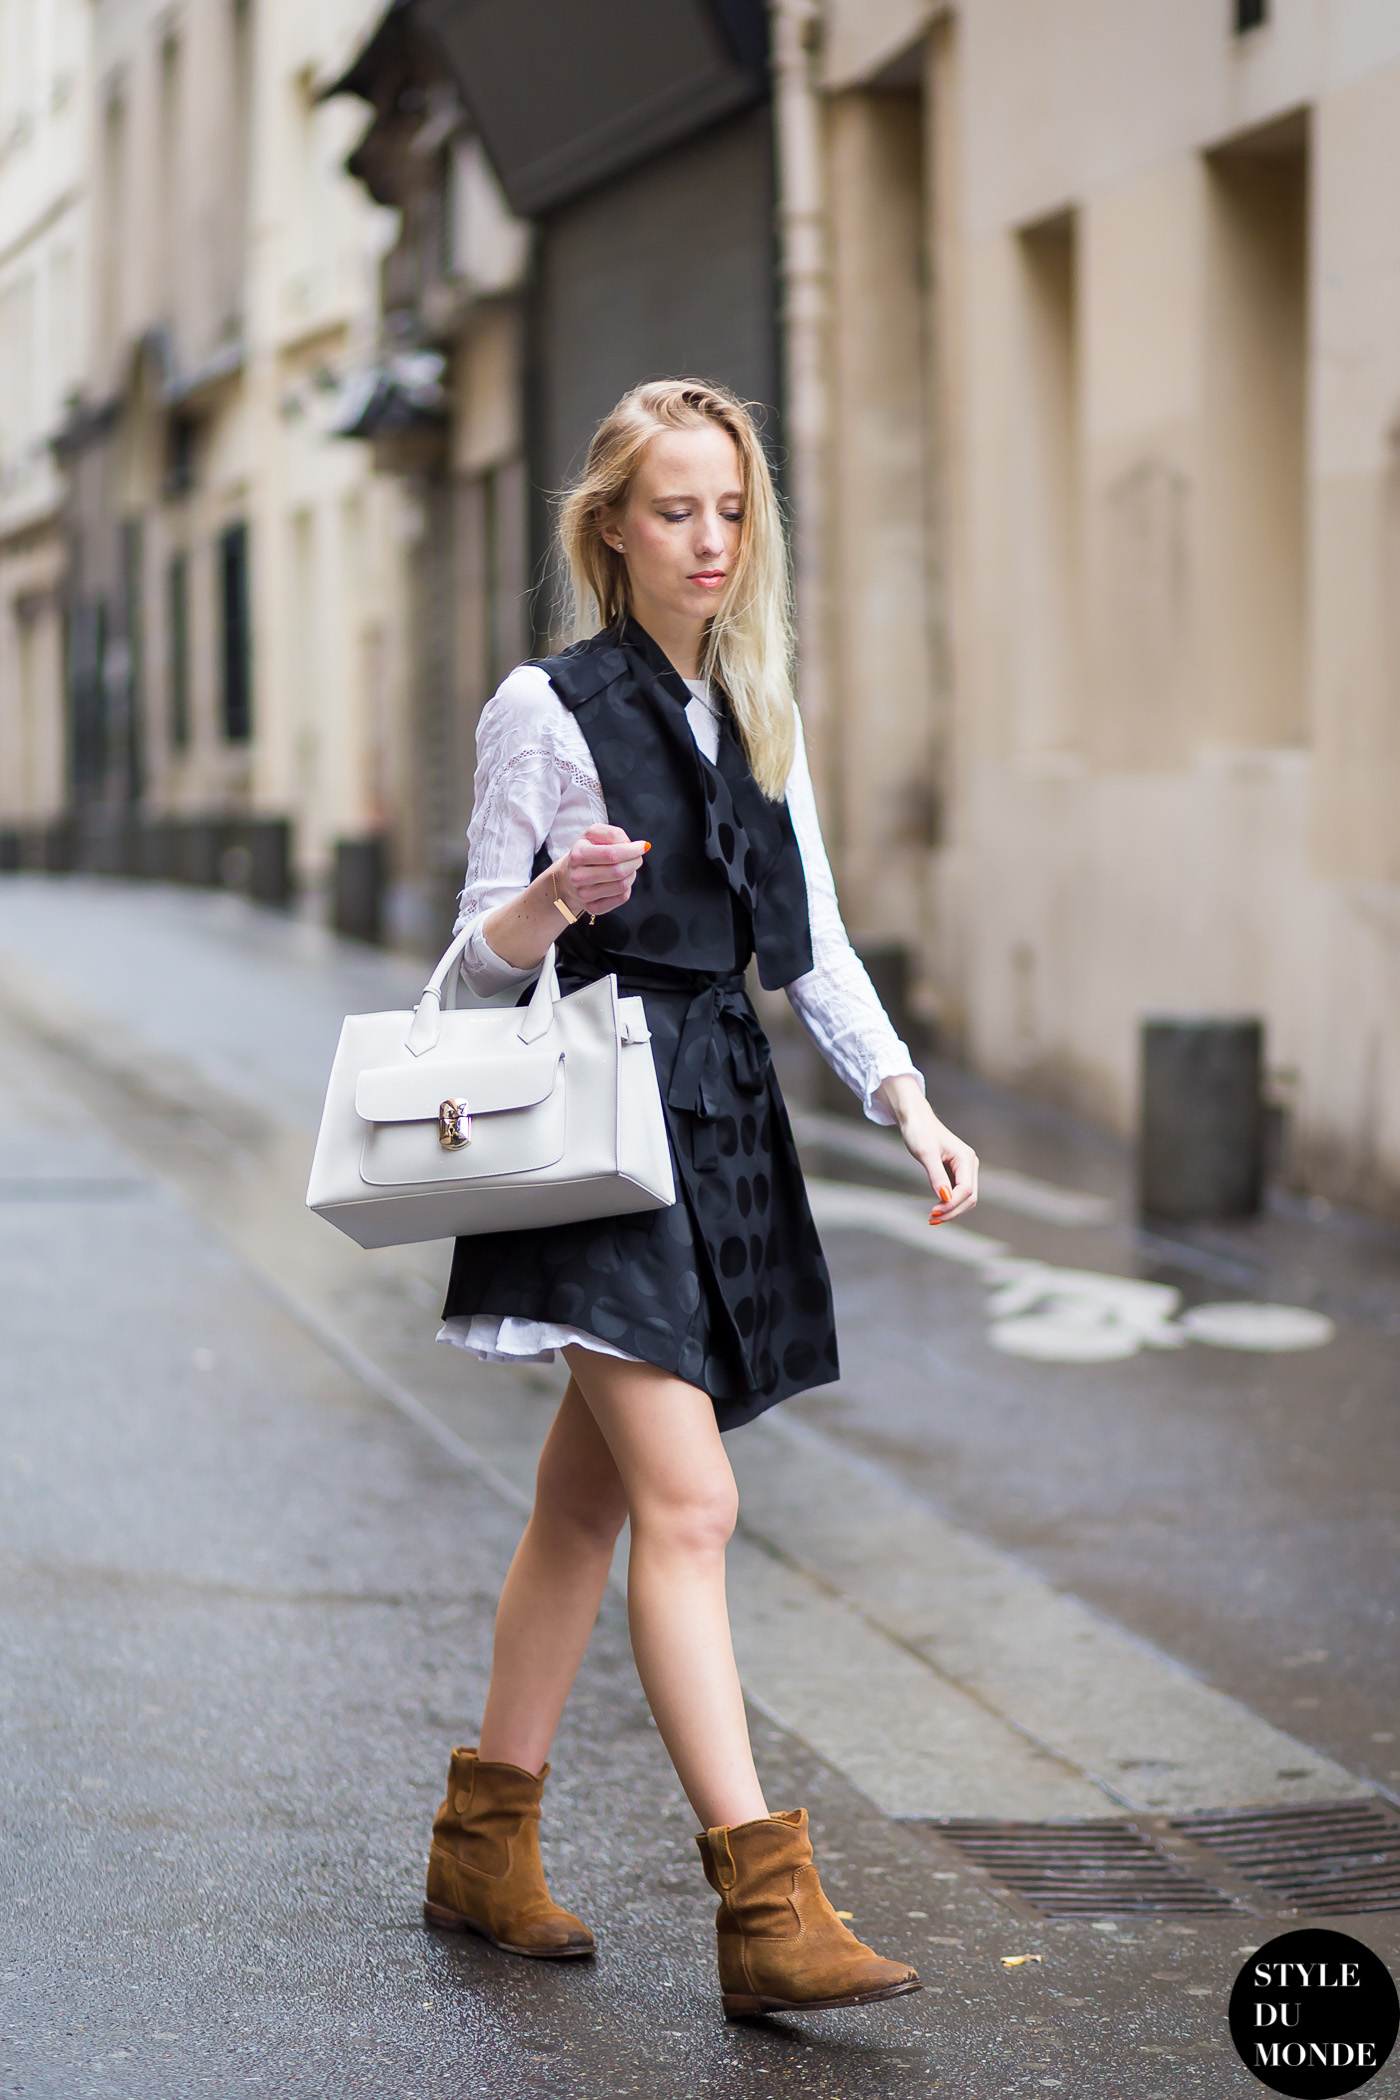 Blackfashion Blog Facebook Puksies Wardrobe Tumblr: Paris Men's Fashion Week Spring 2015 Street Style: Alice